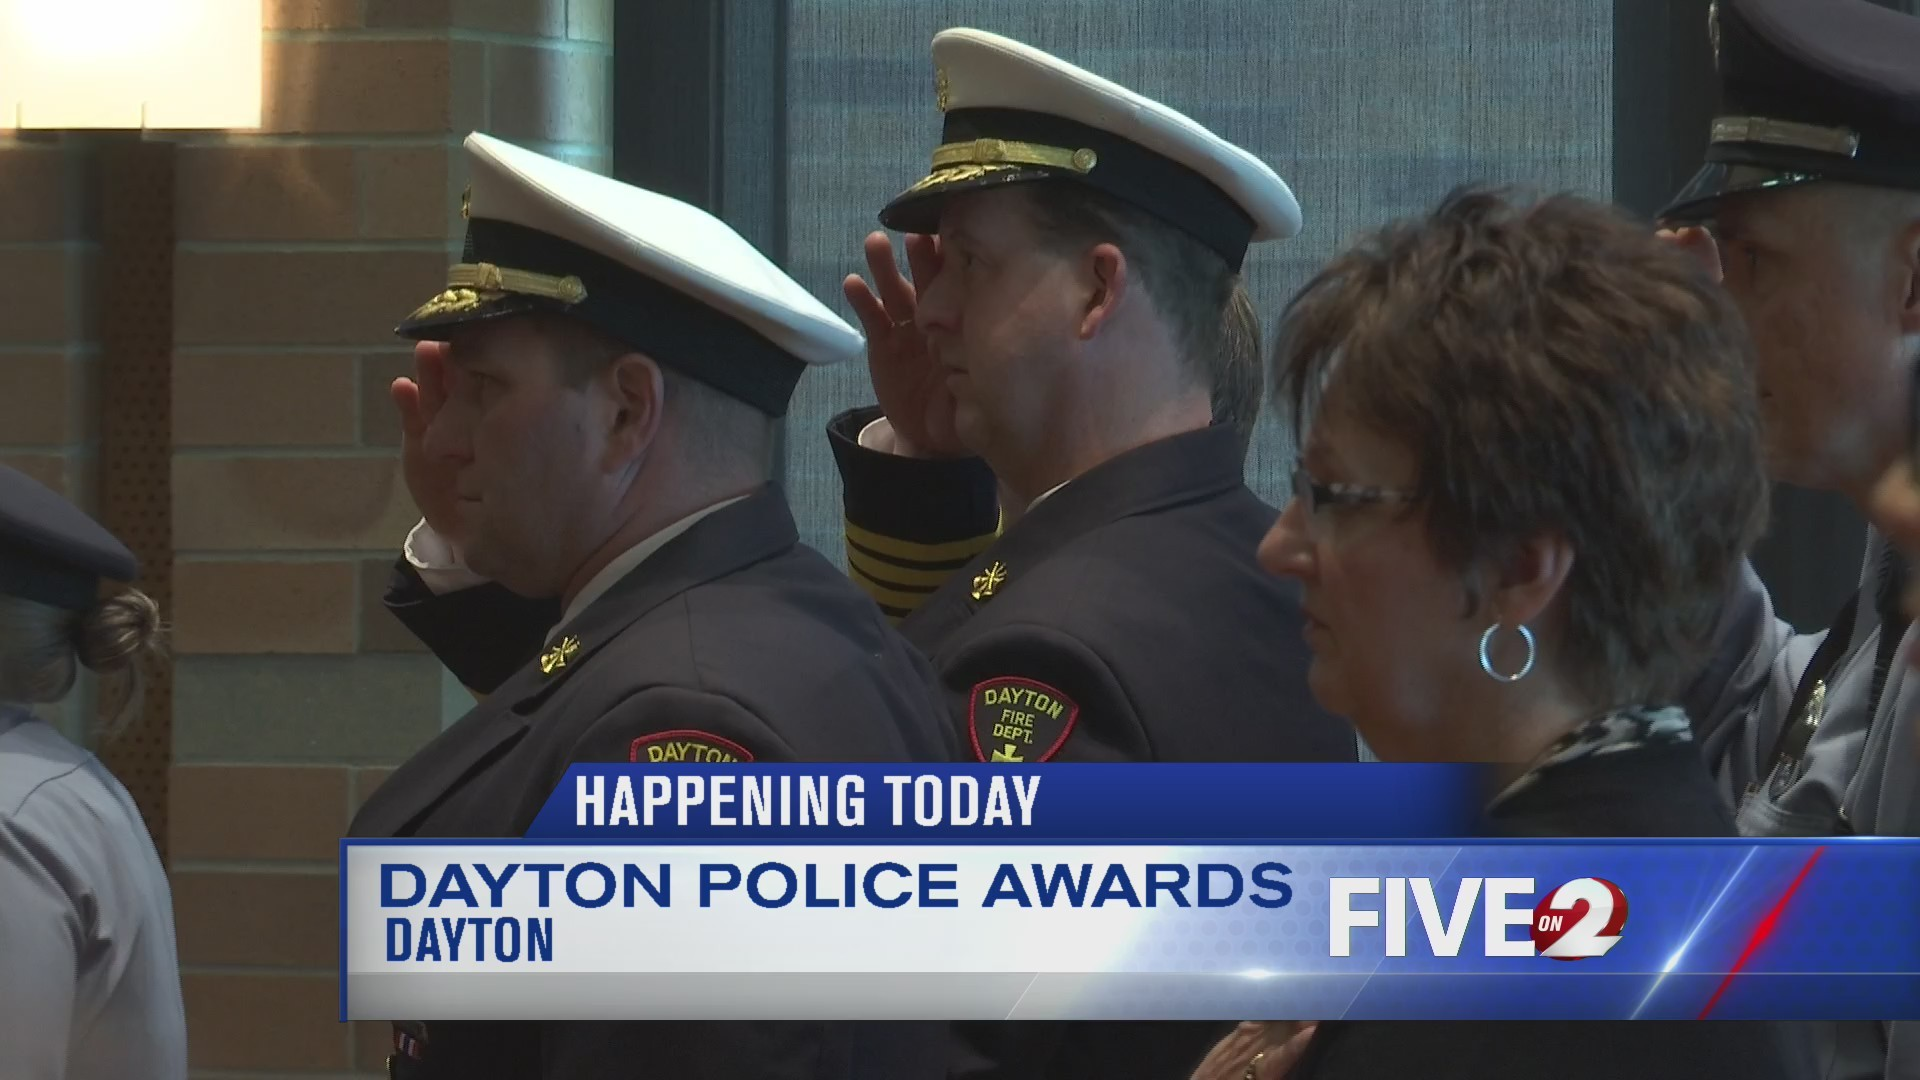 Dayton Police Dept. awards